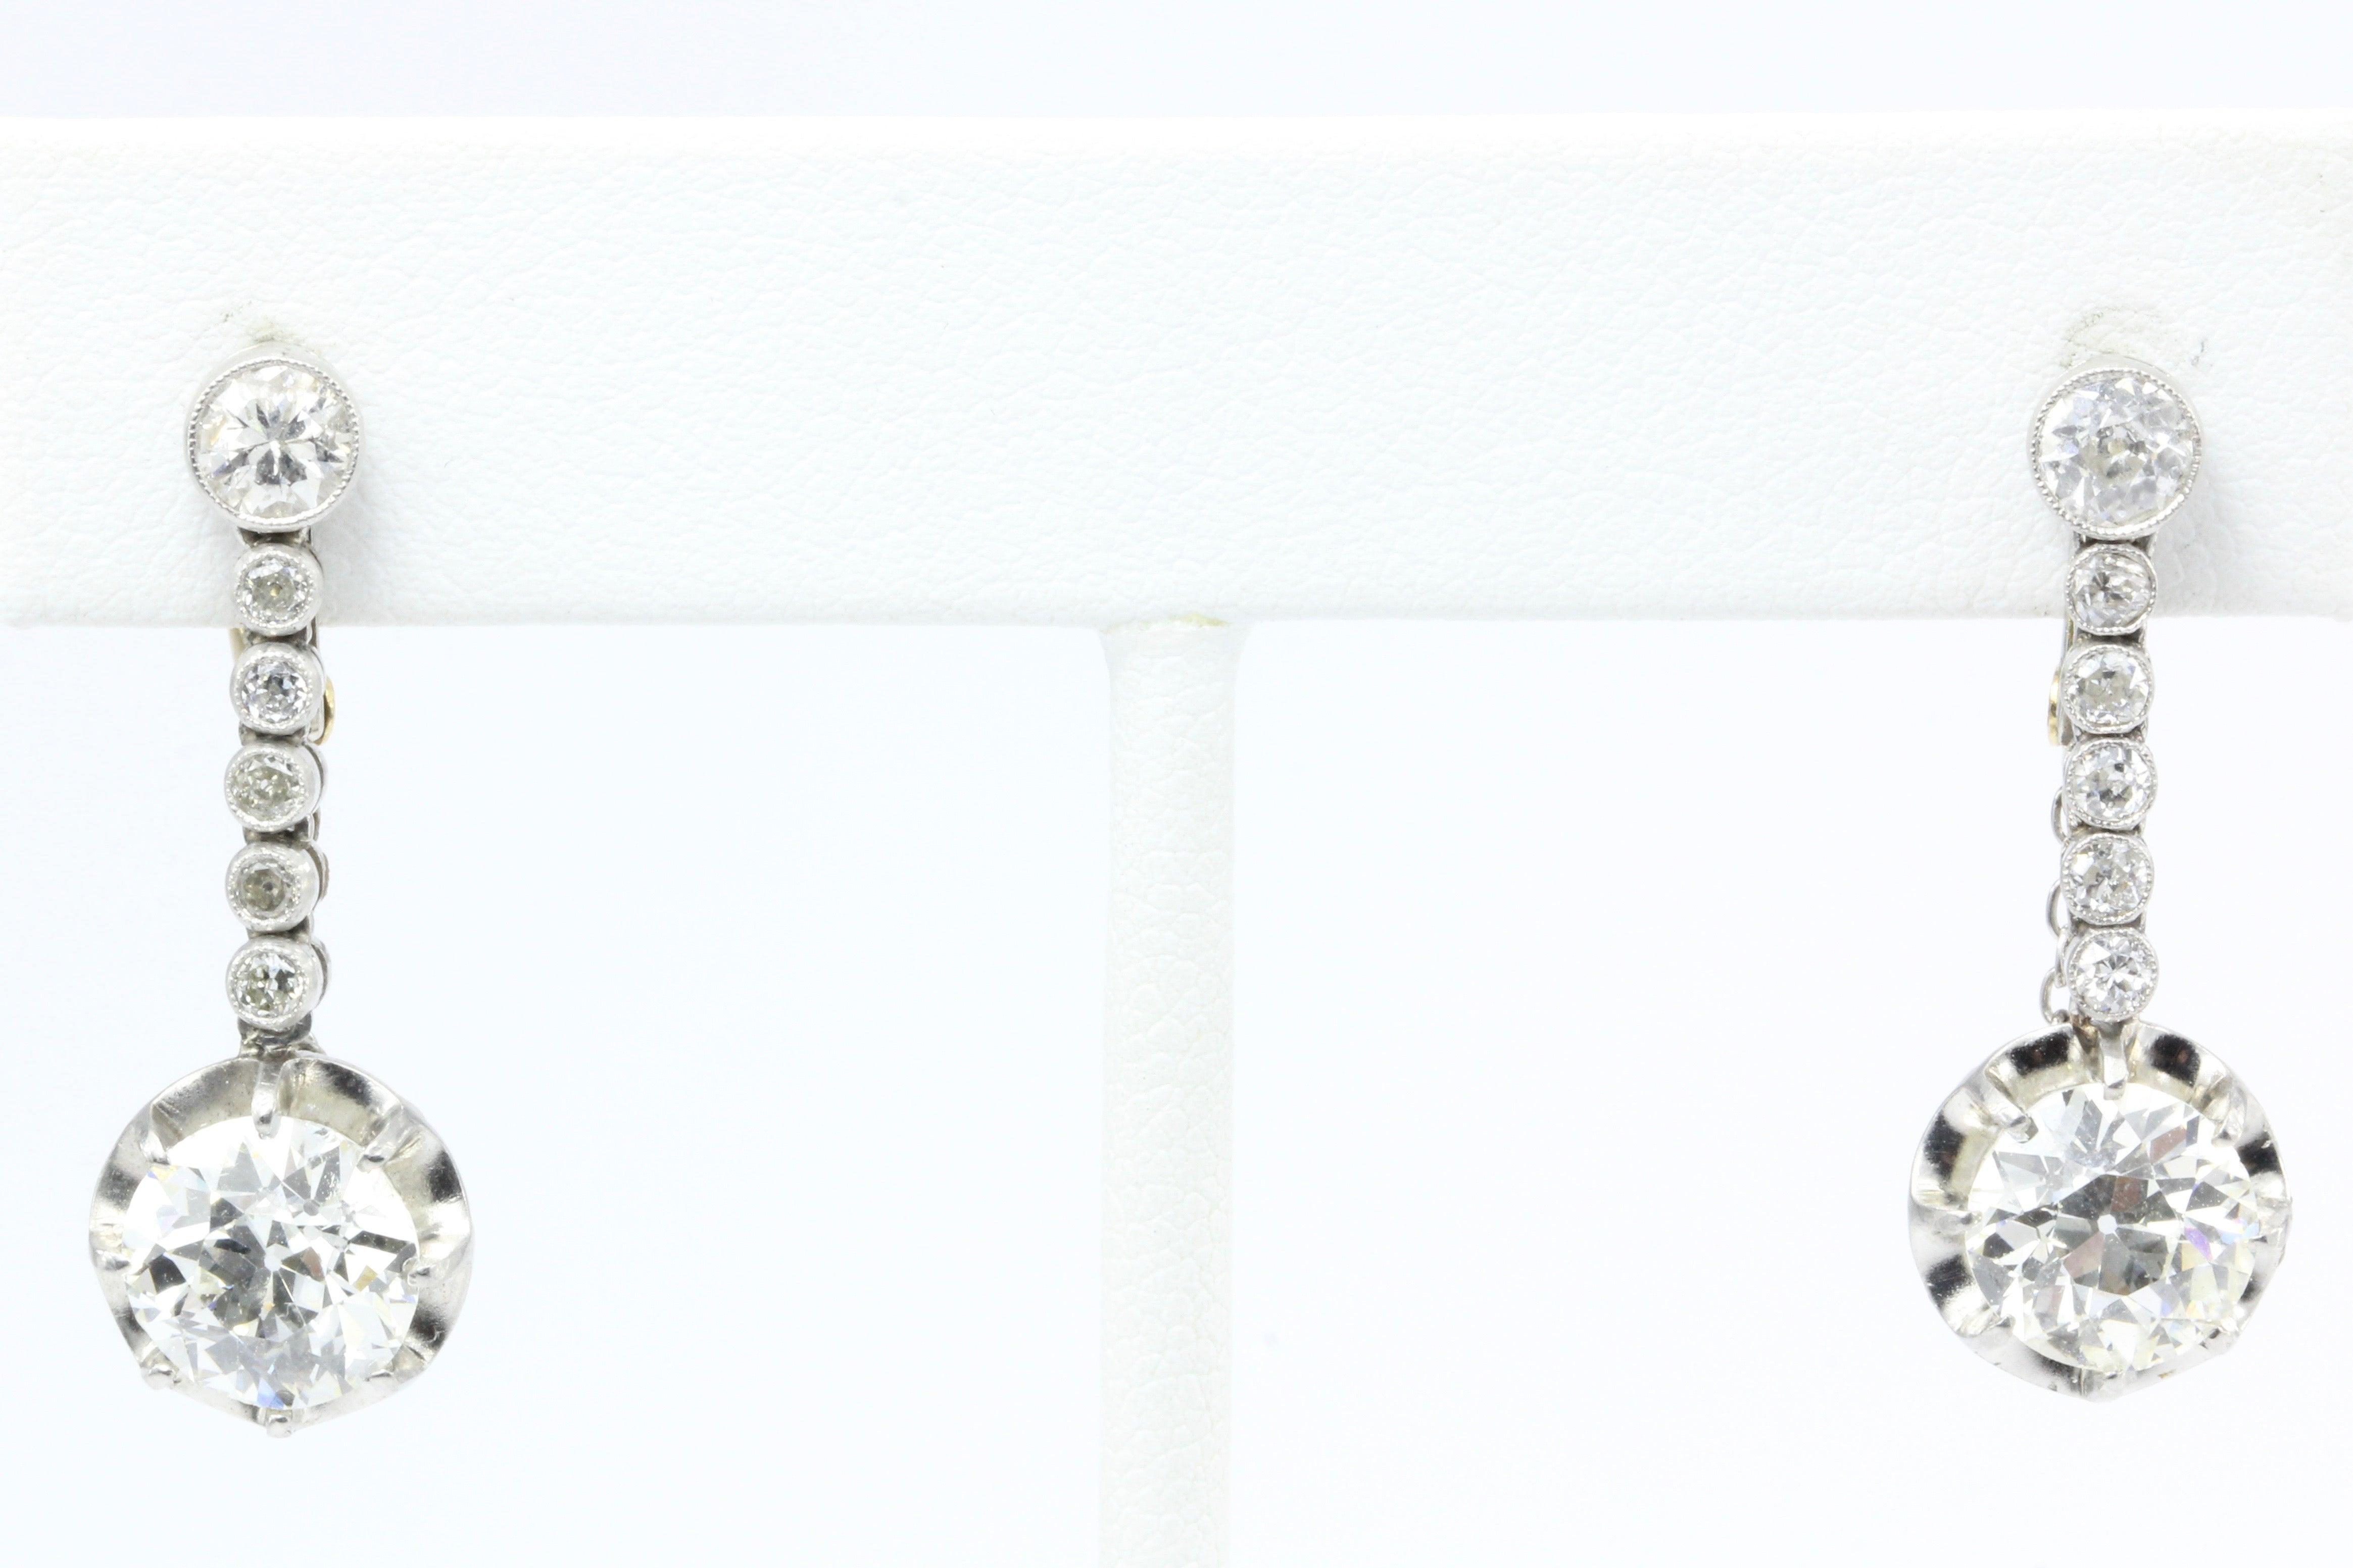 Edwardian 4 58 Carat Drop Diamond Earrings at 1stdibs